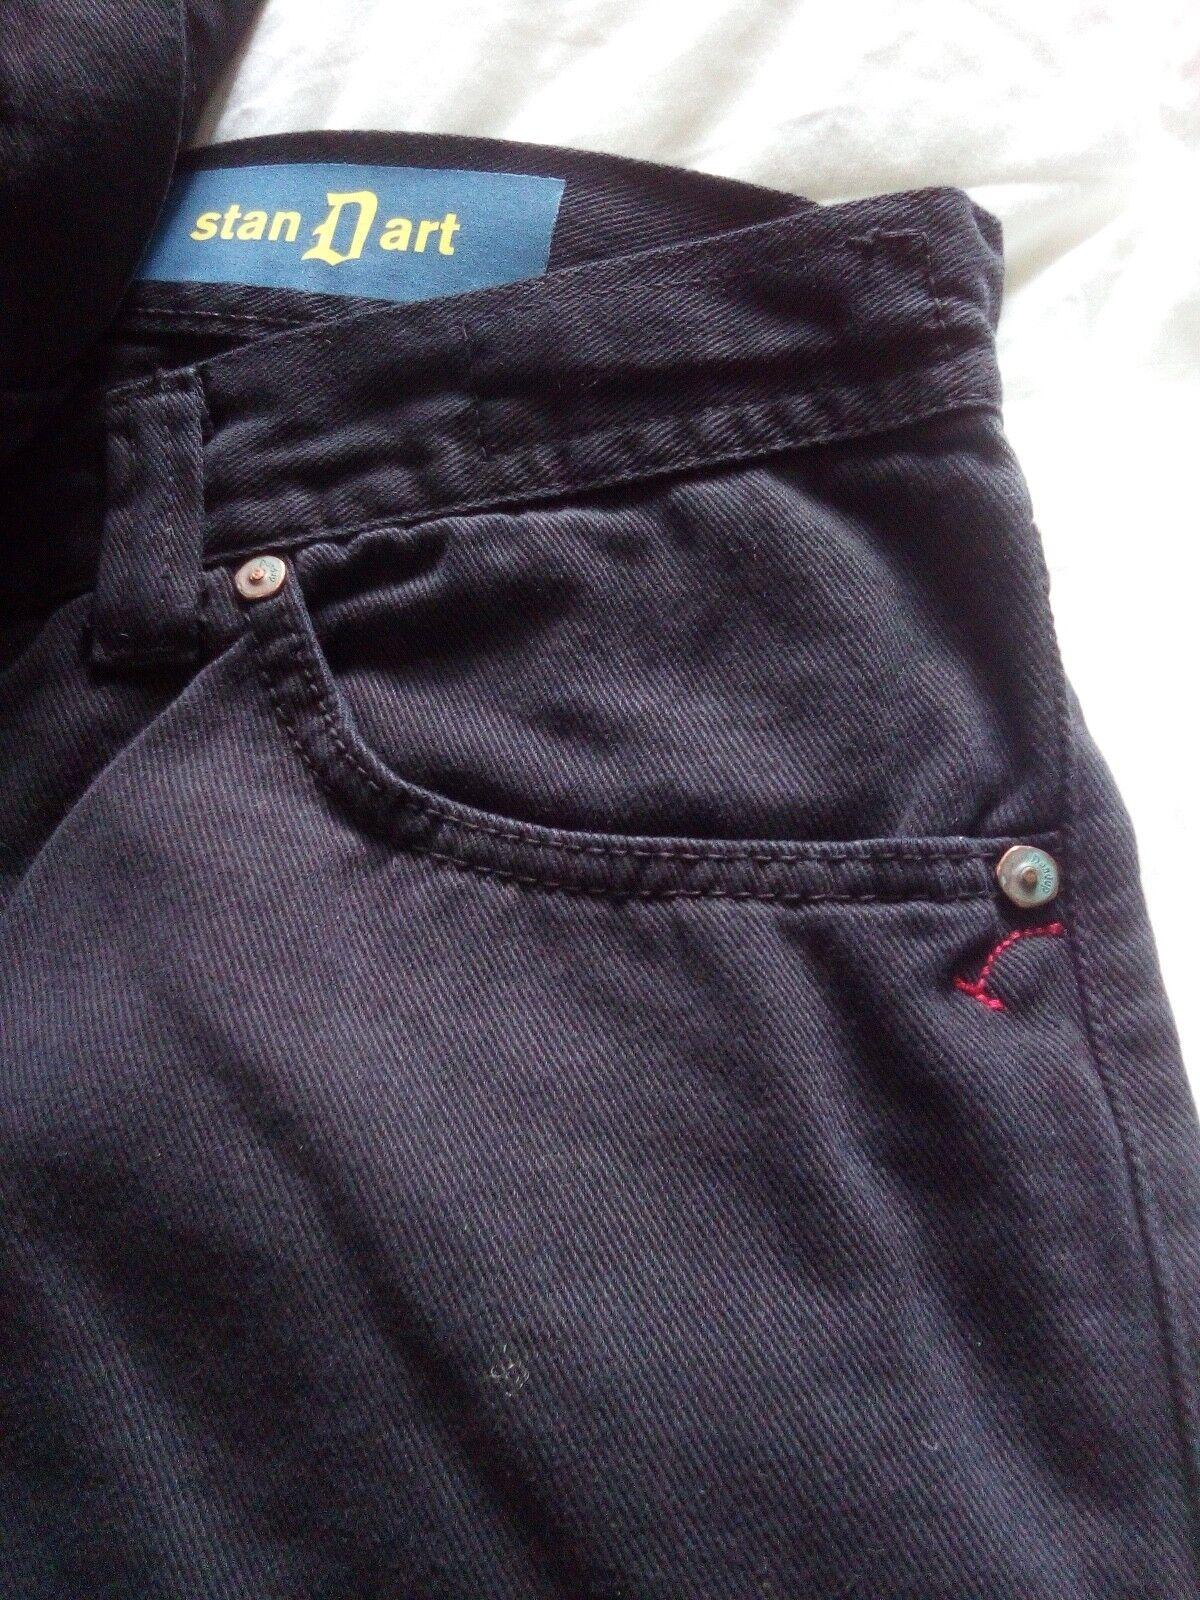 Jeans DONDUP Nero mod.MUSIC tgl 36 36 36 cod.UP008015U edizione limitata 3ecc06